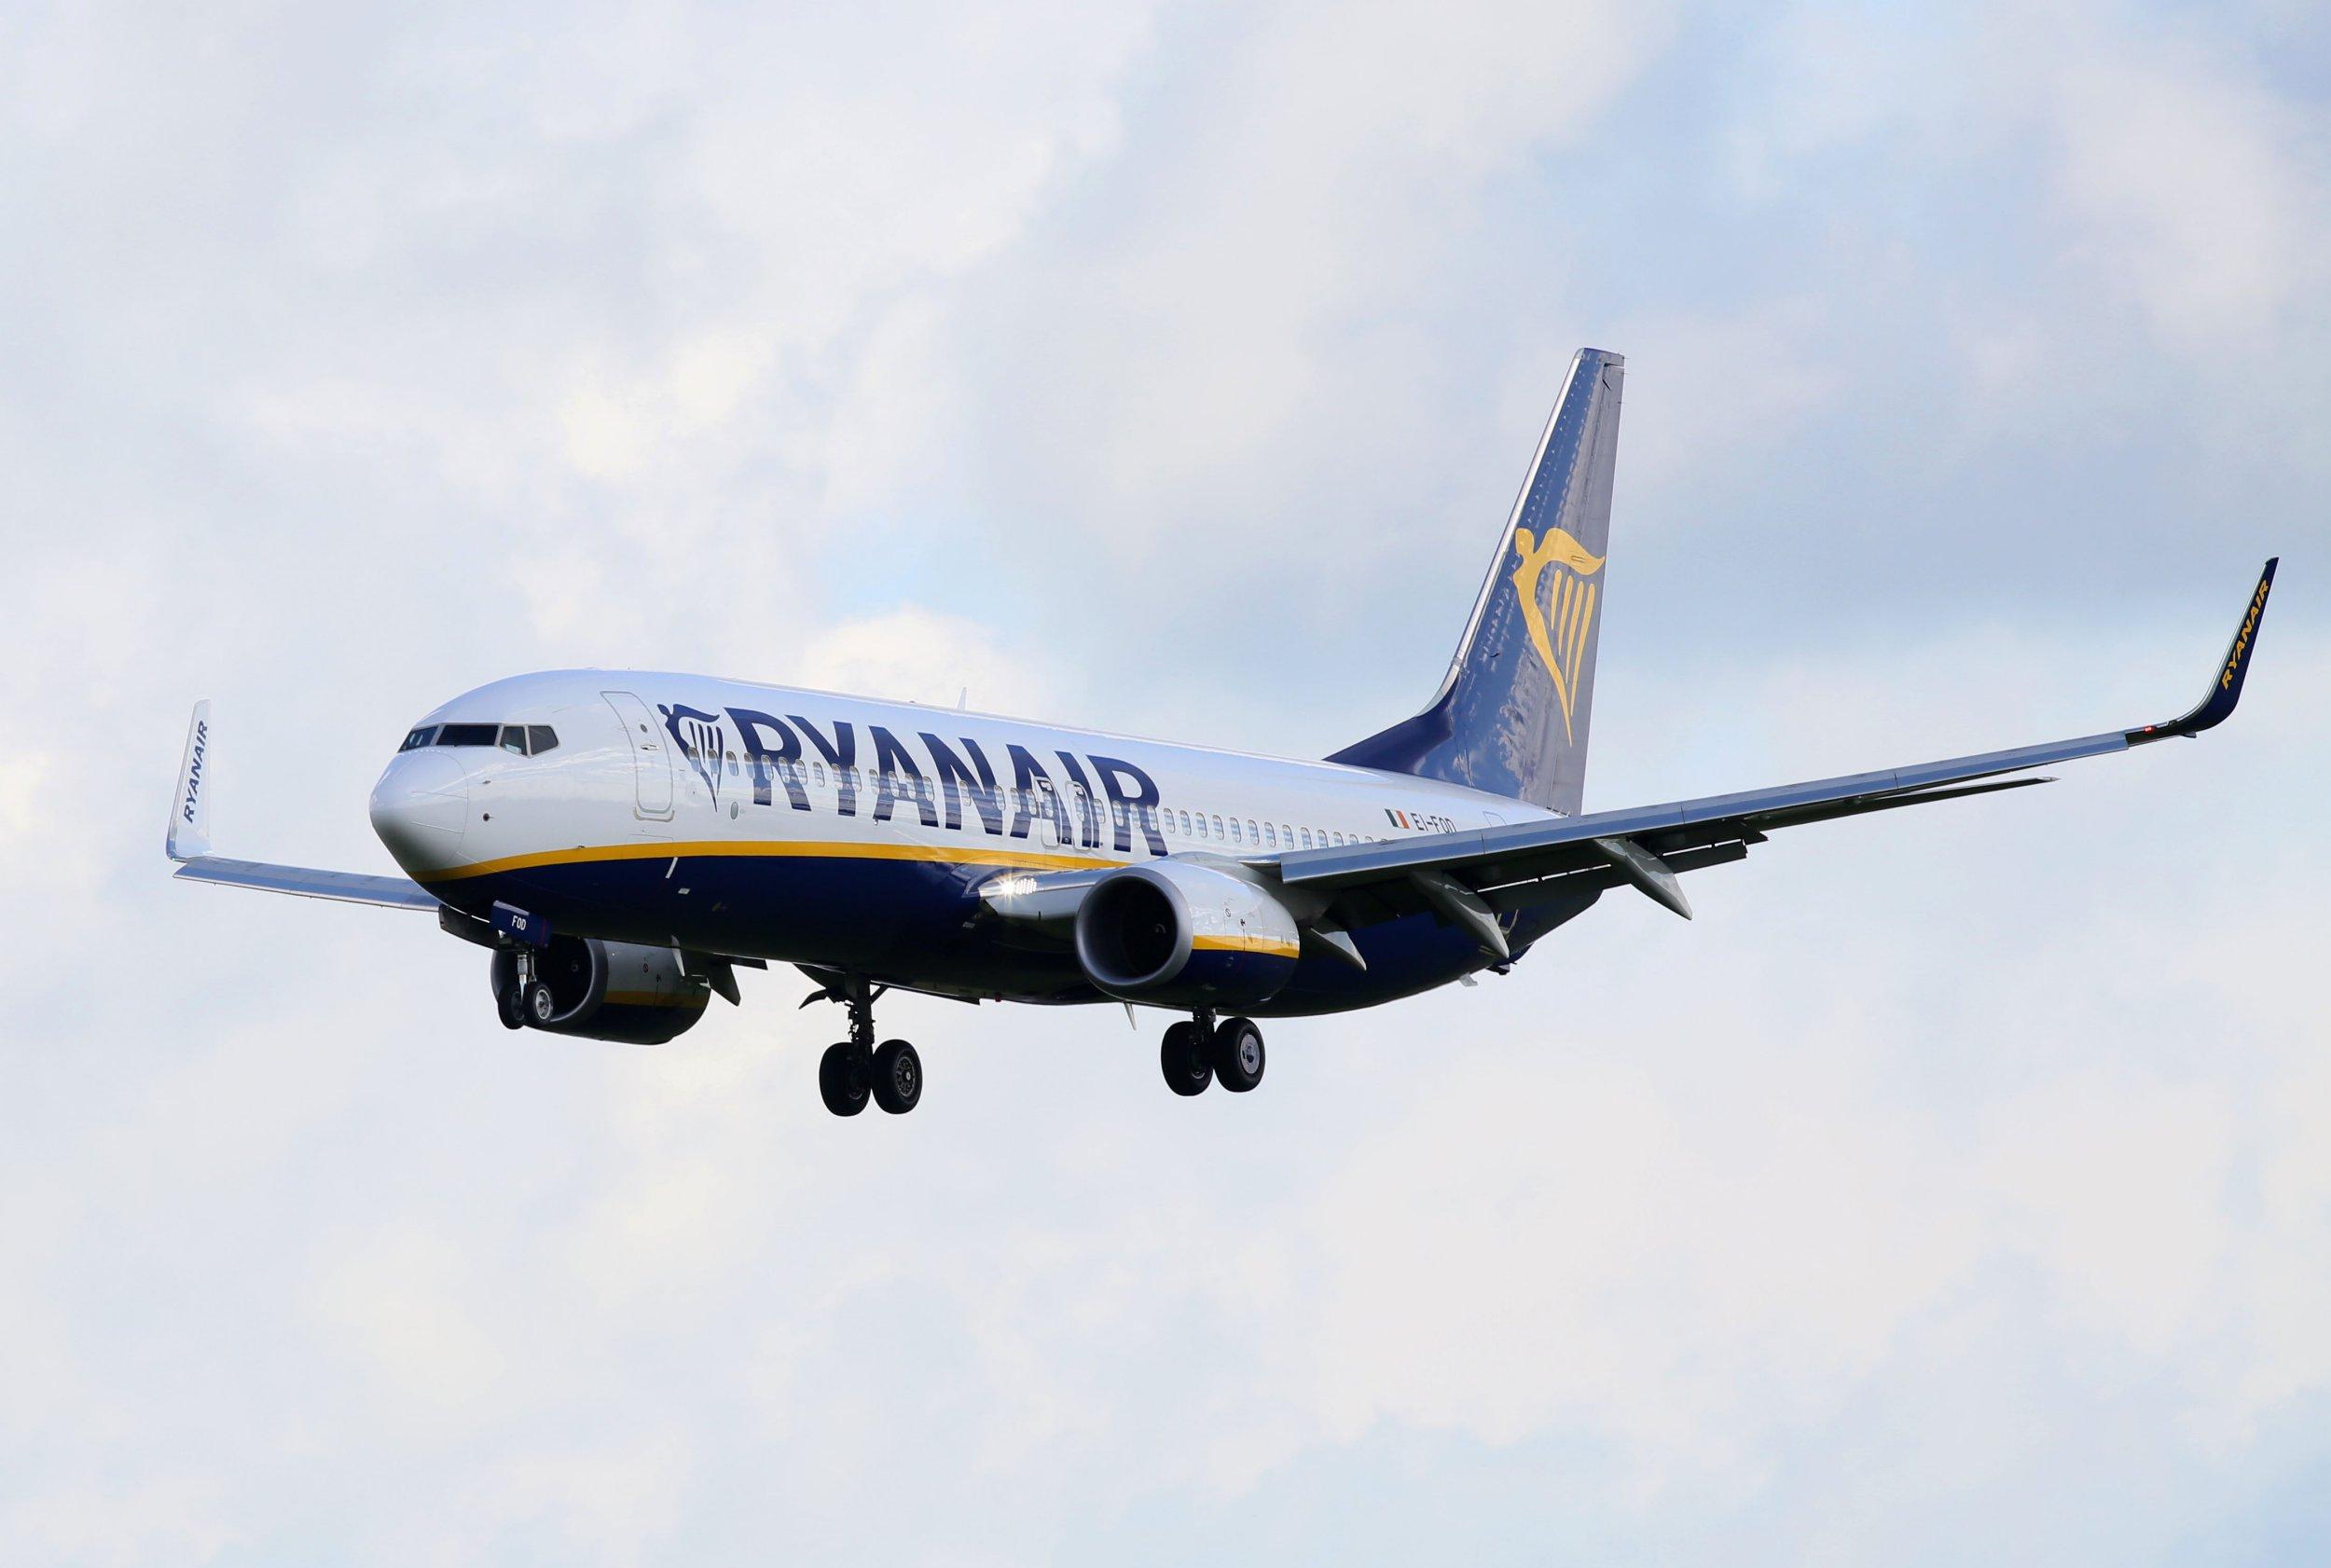 Ryanair offers summer holiday flights from £5.99